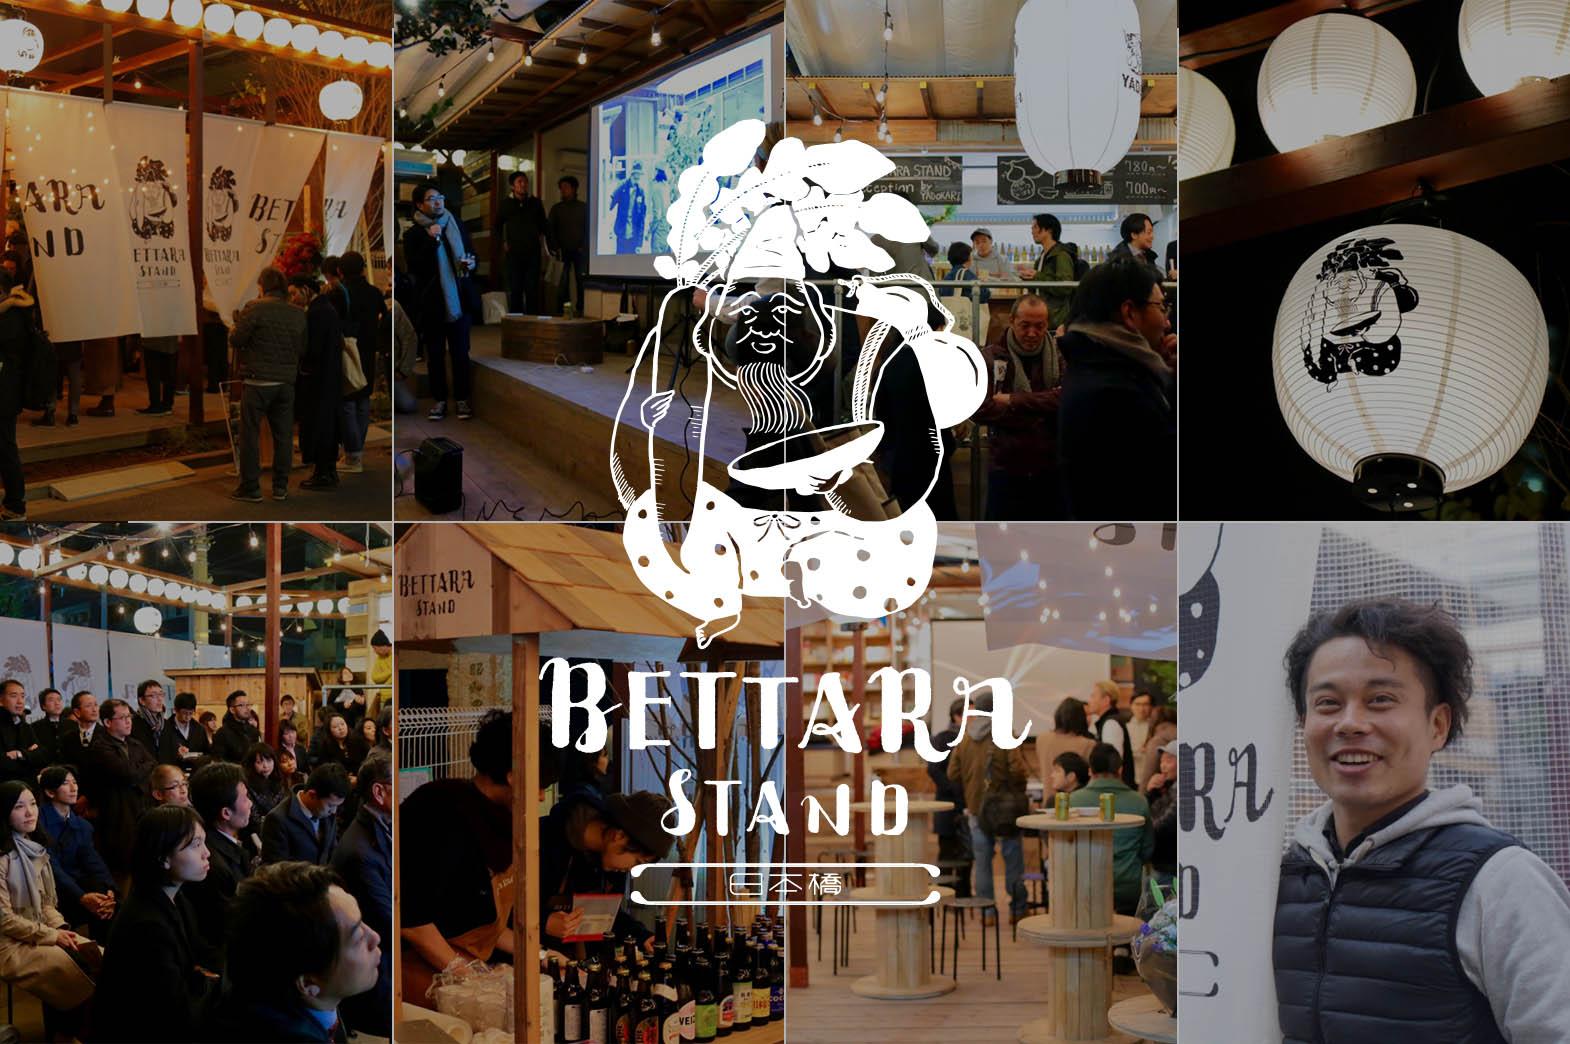 【BETTARA STAND 採用募集】日本橋から新しい文化を創るコミュニティビルダー募集!(業務委託・複業OK)